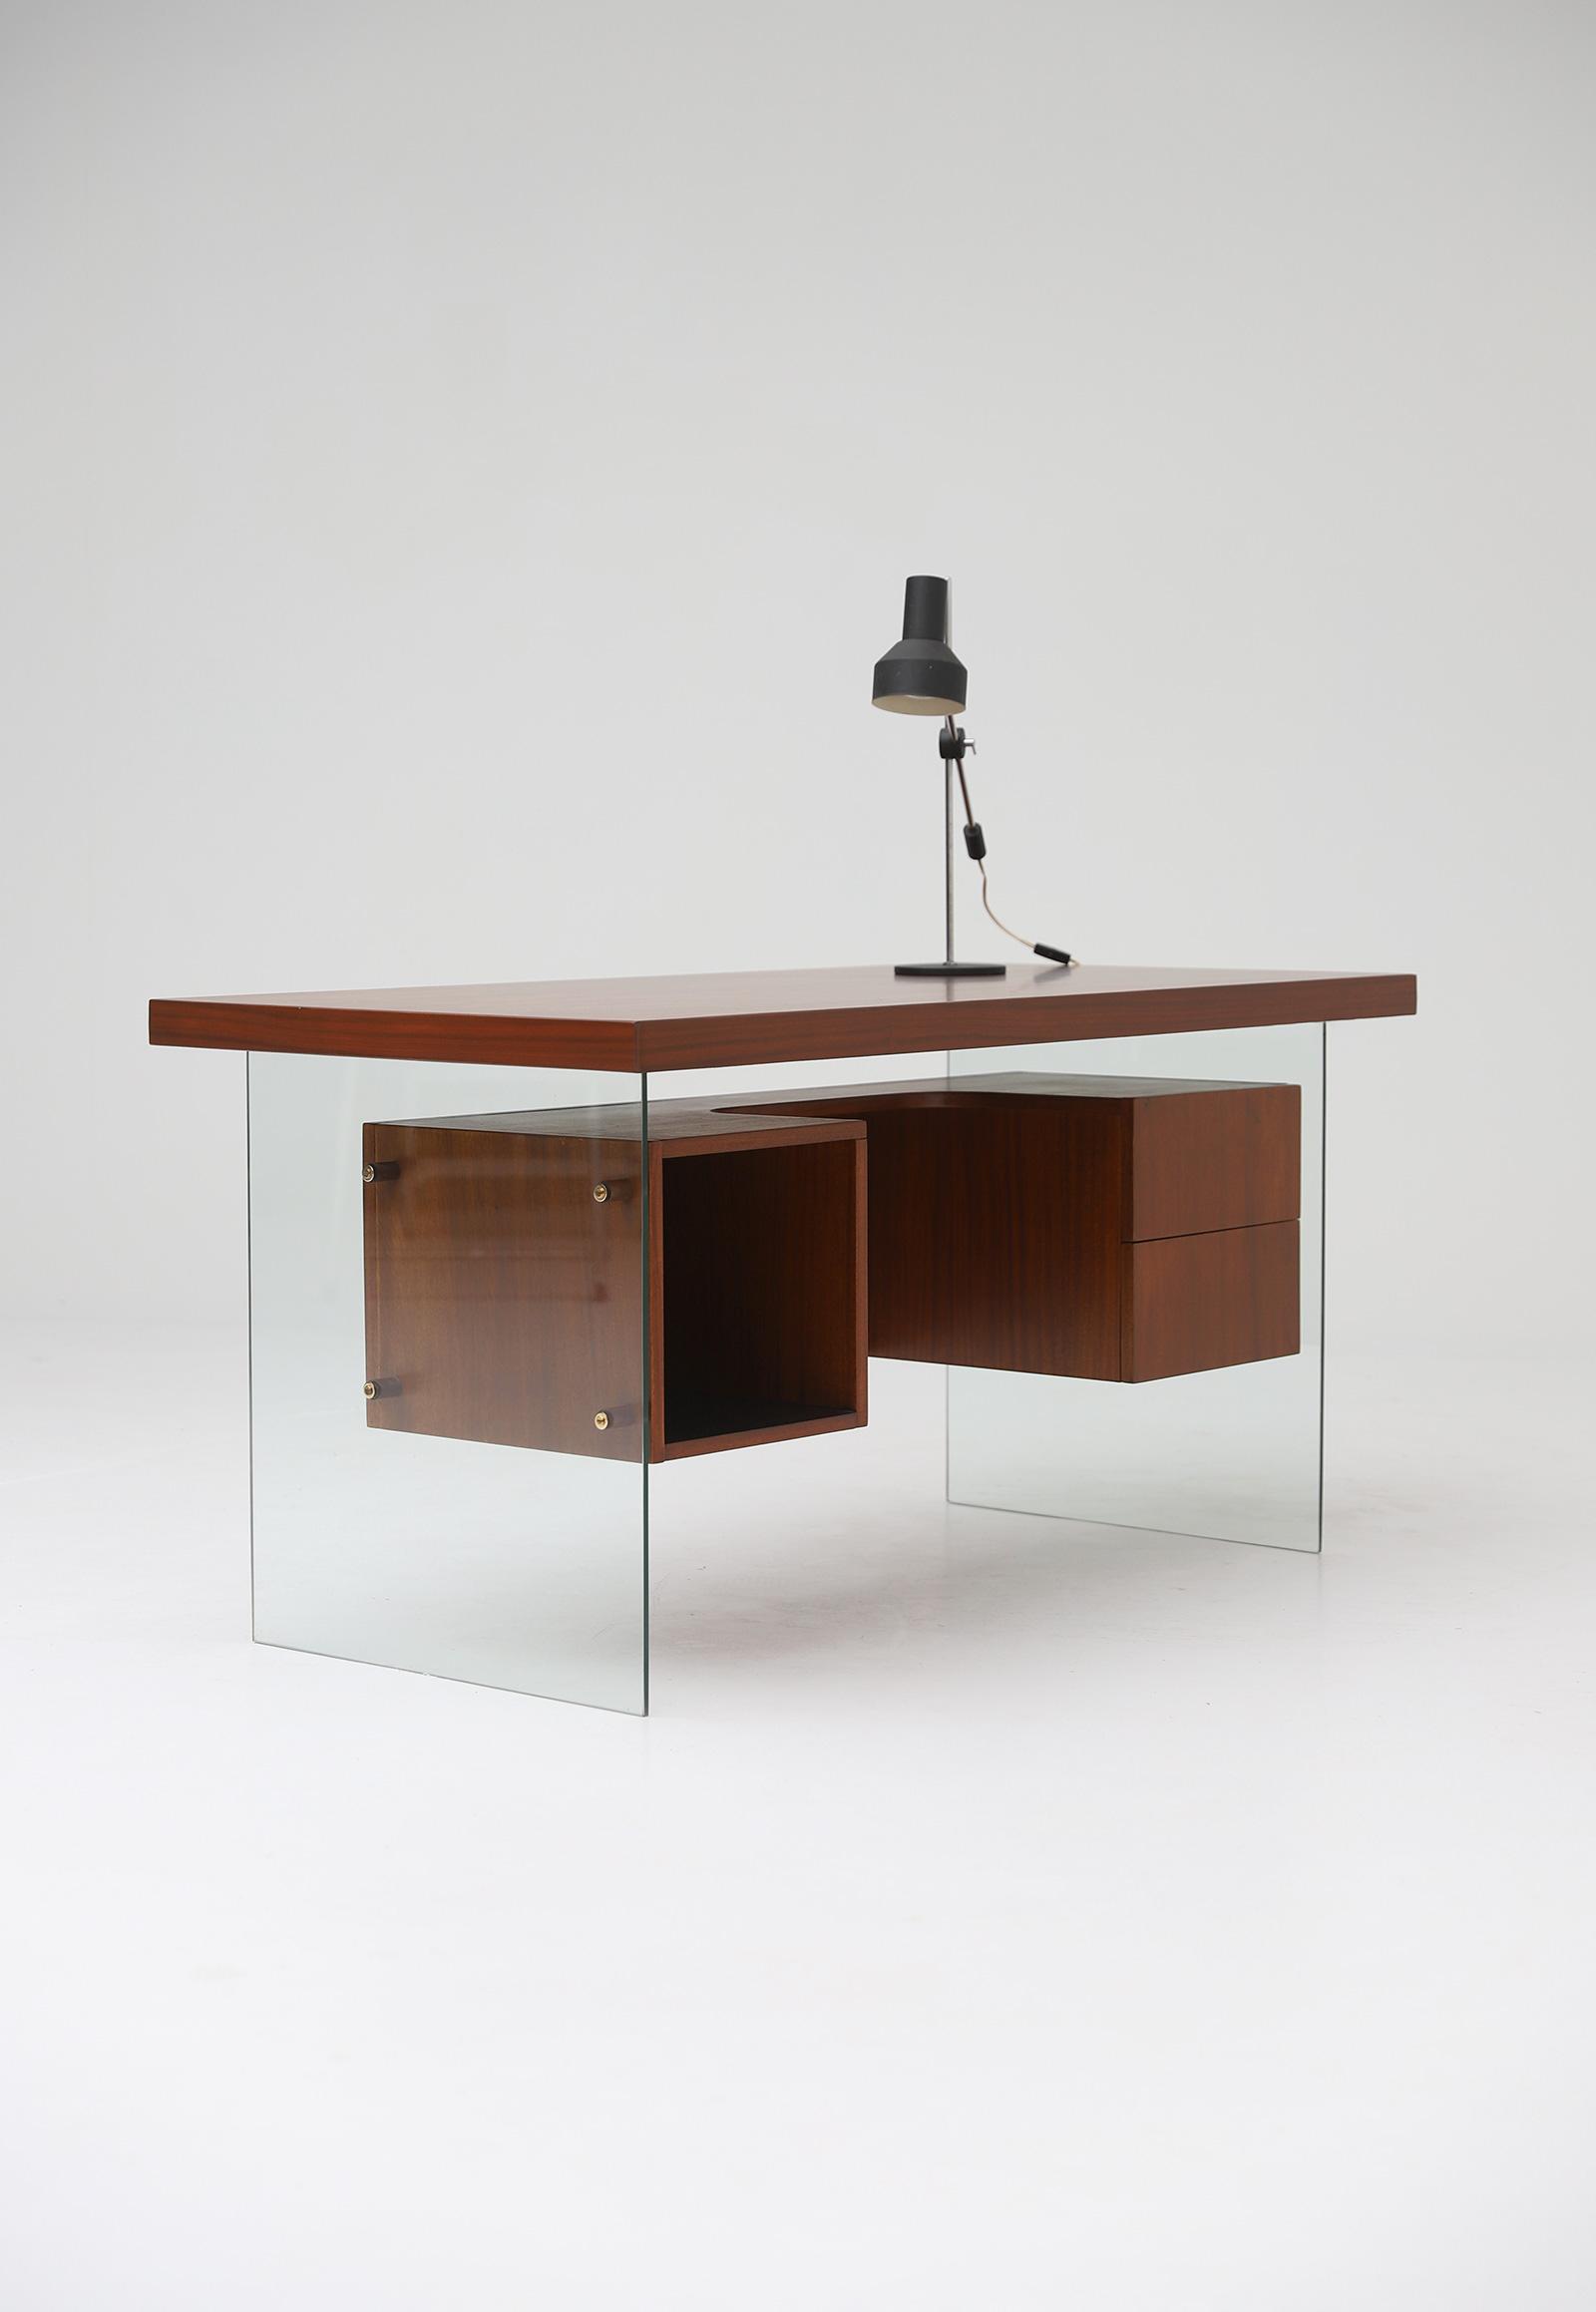 Modernist desk in the manner of Jacques Dumond, 1950simage 6